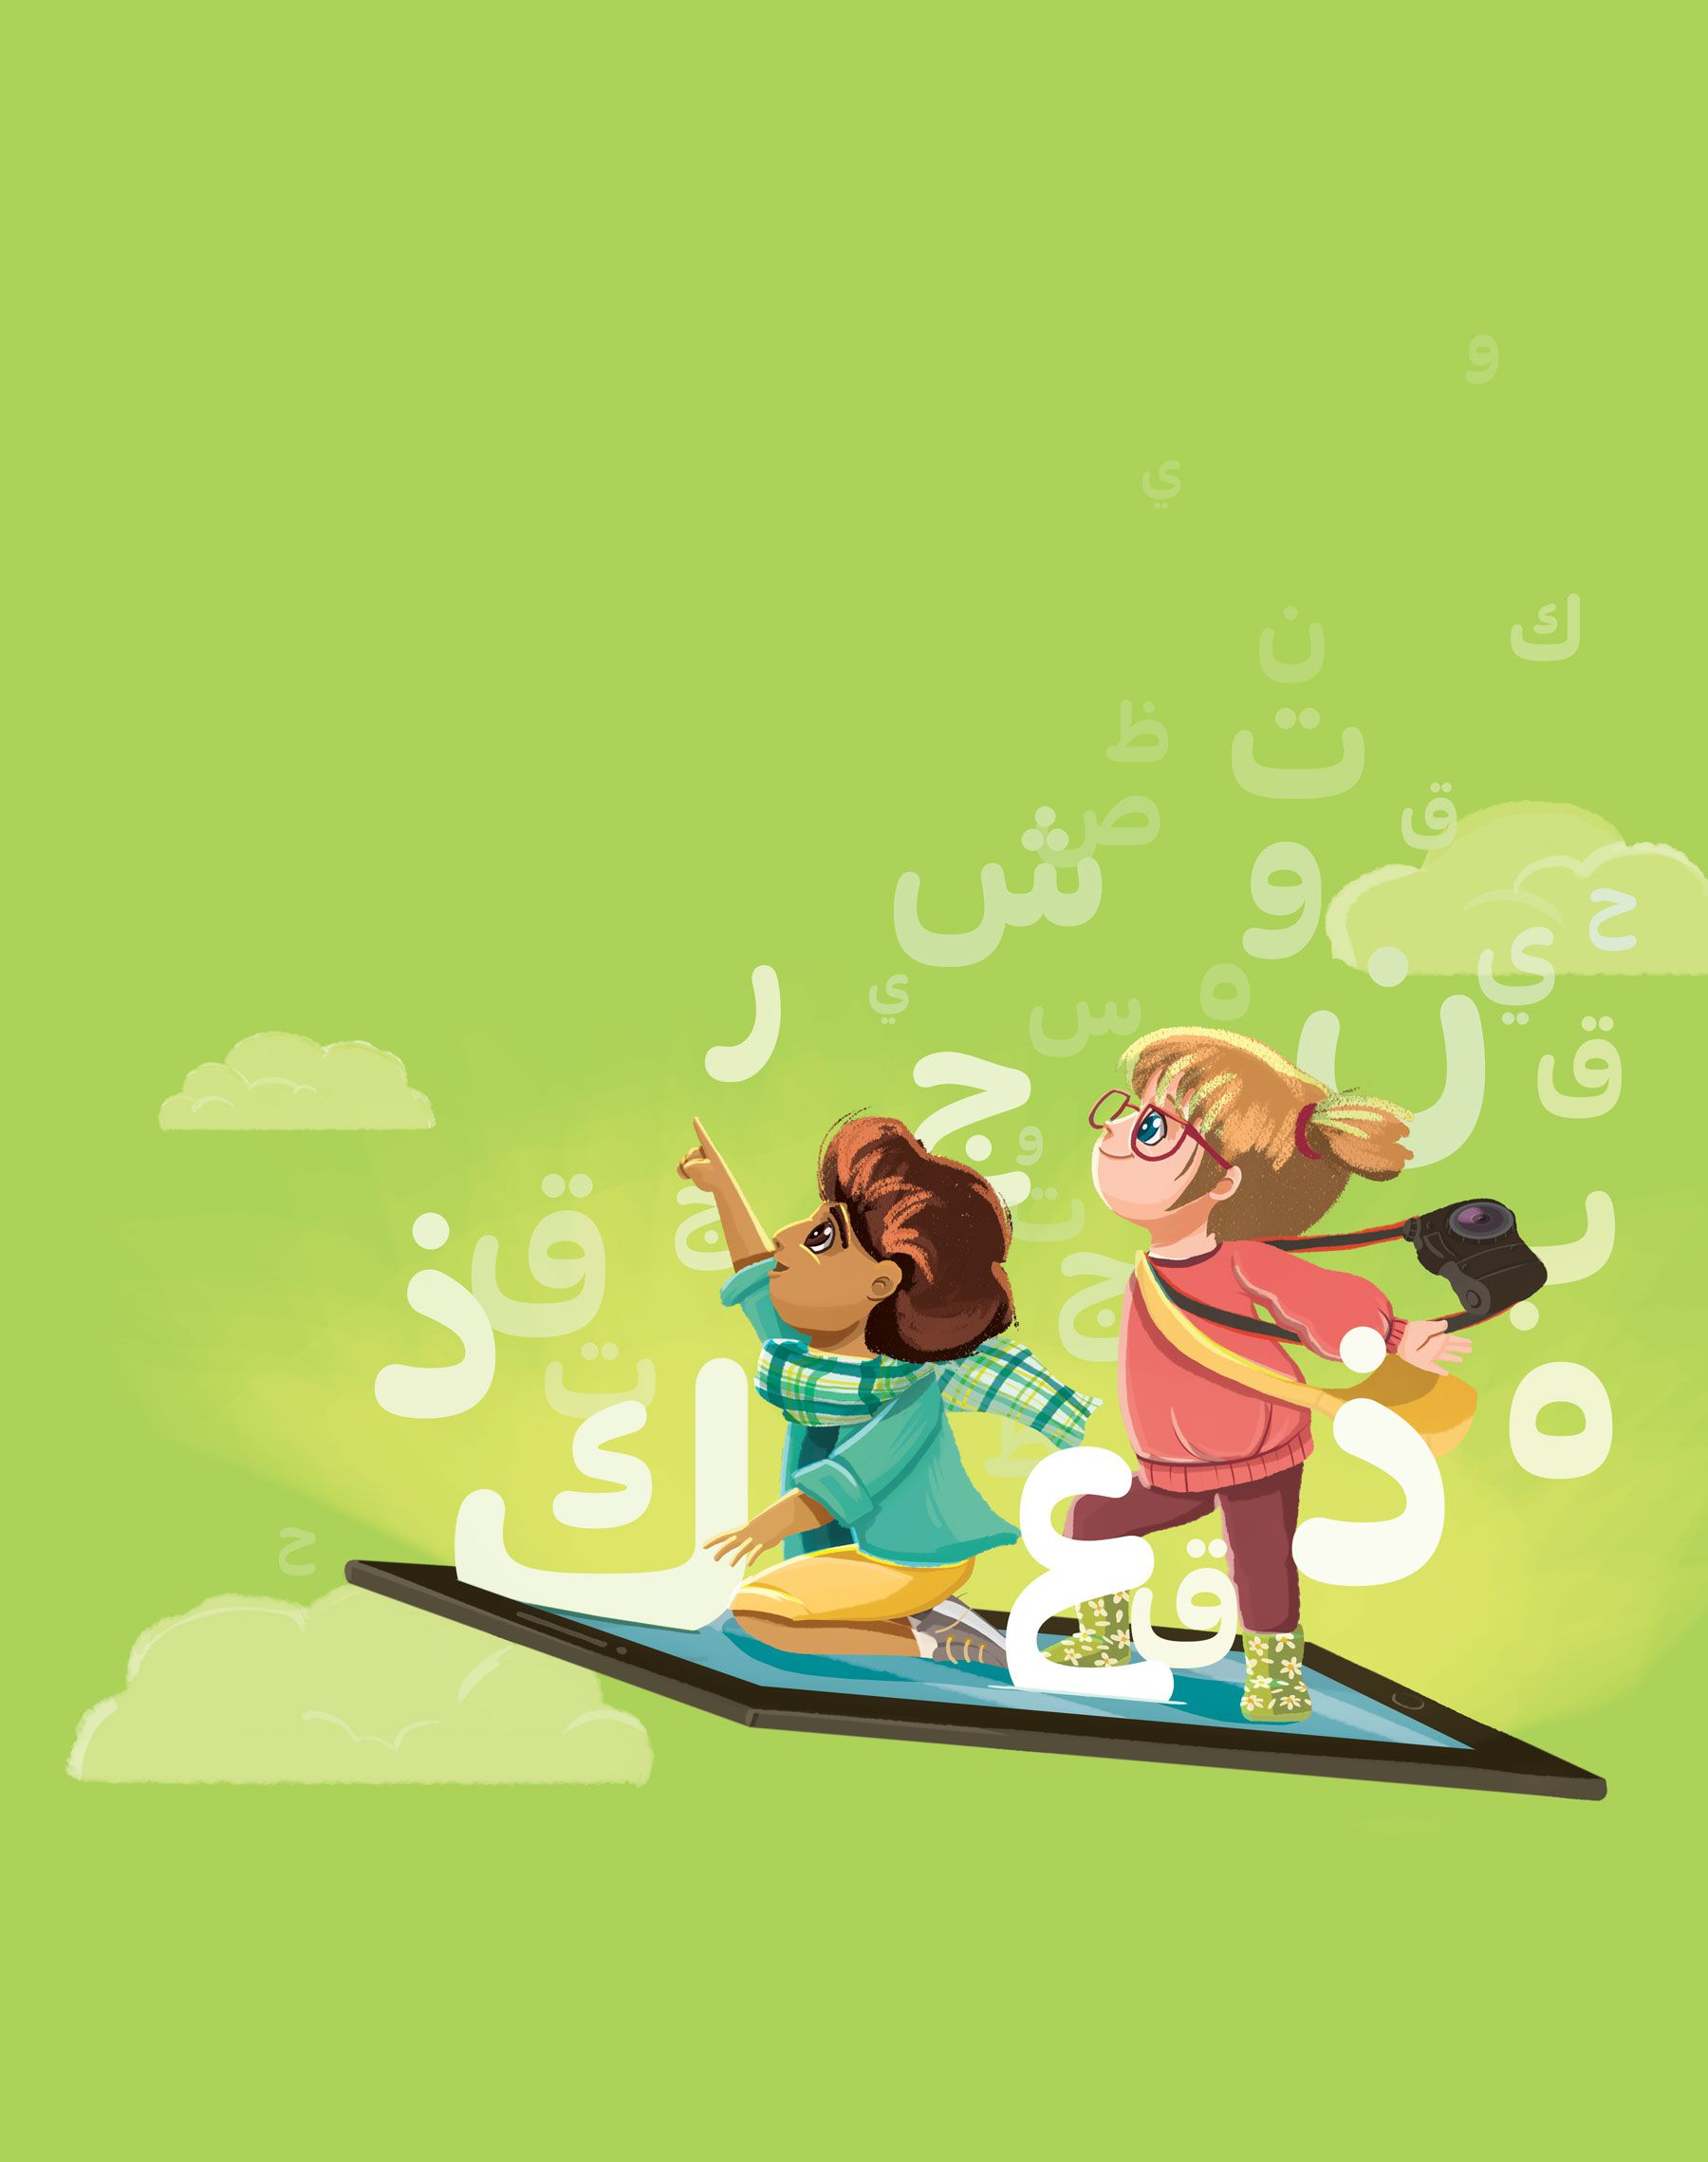 Pearson Arabic language learning illustration